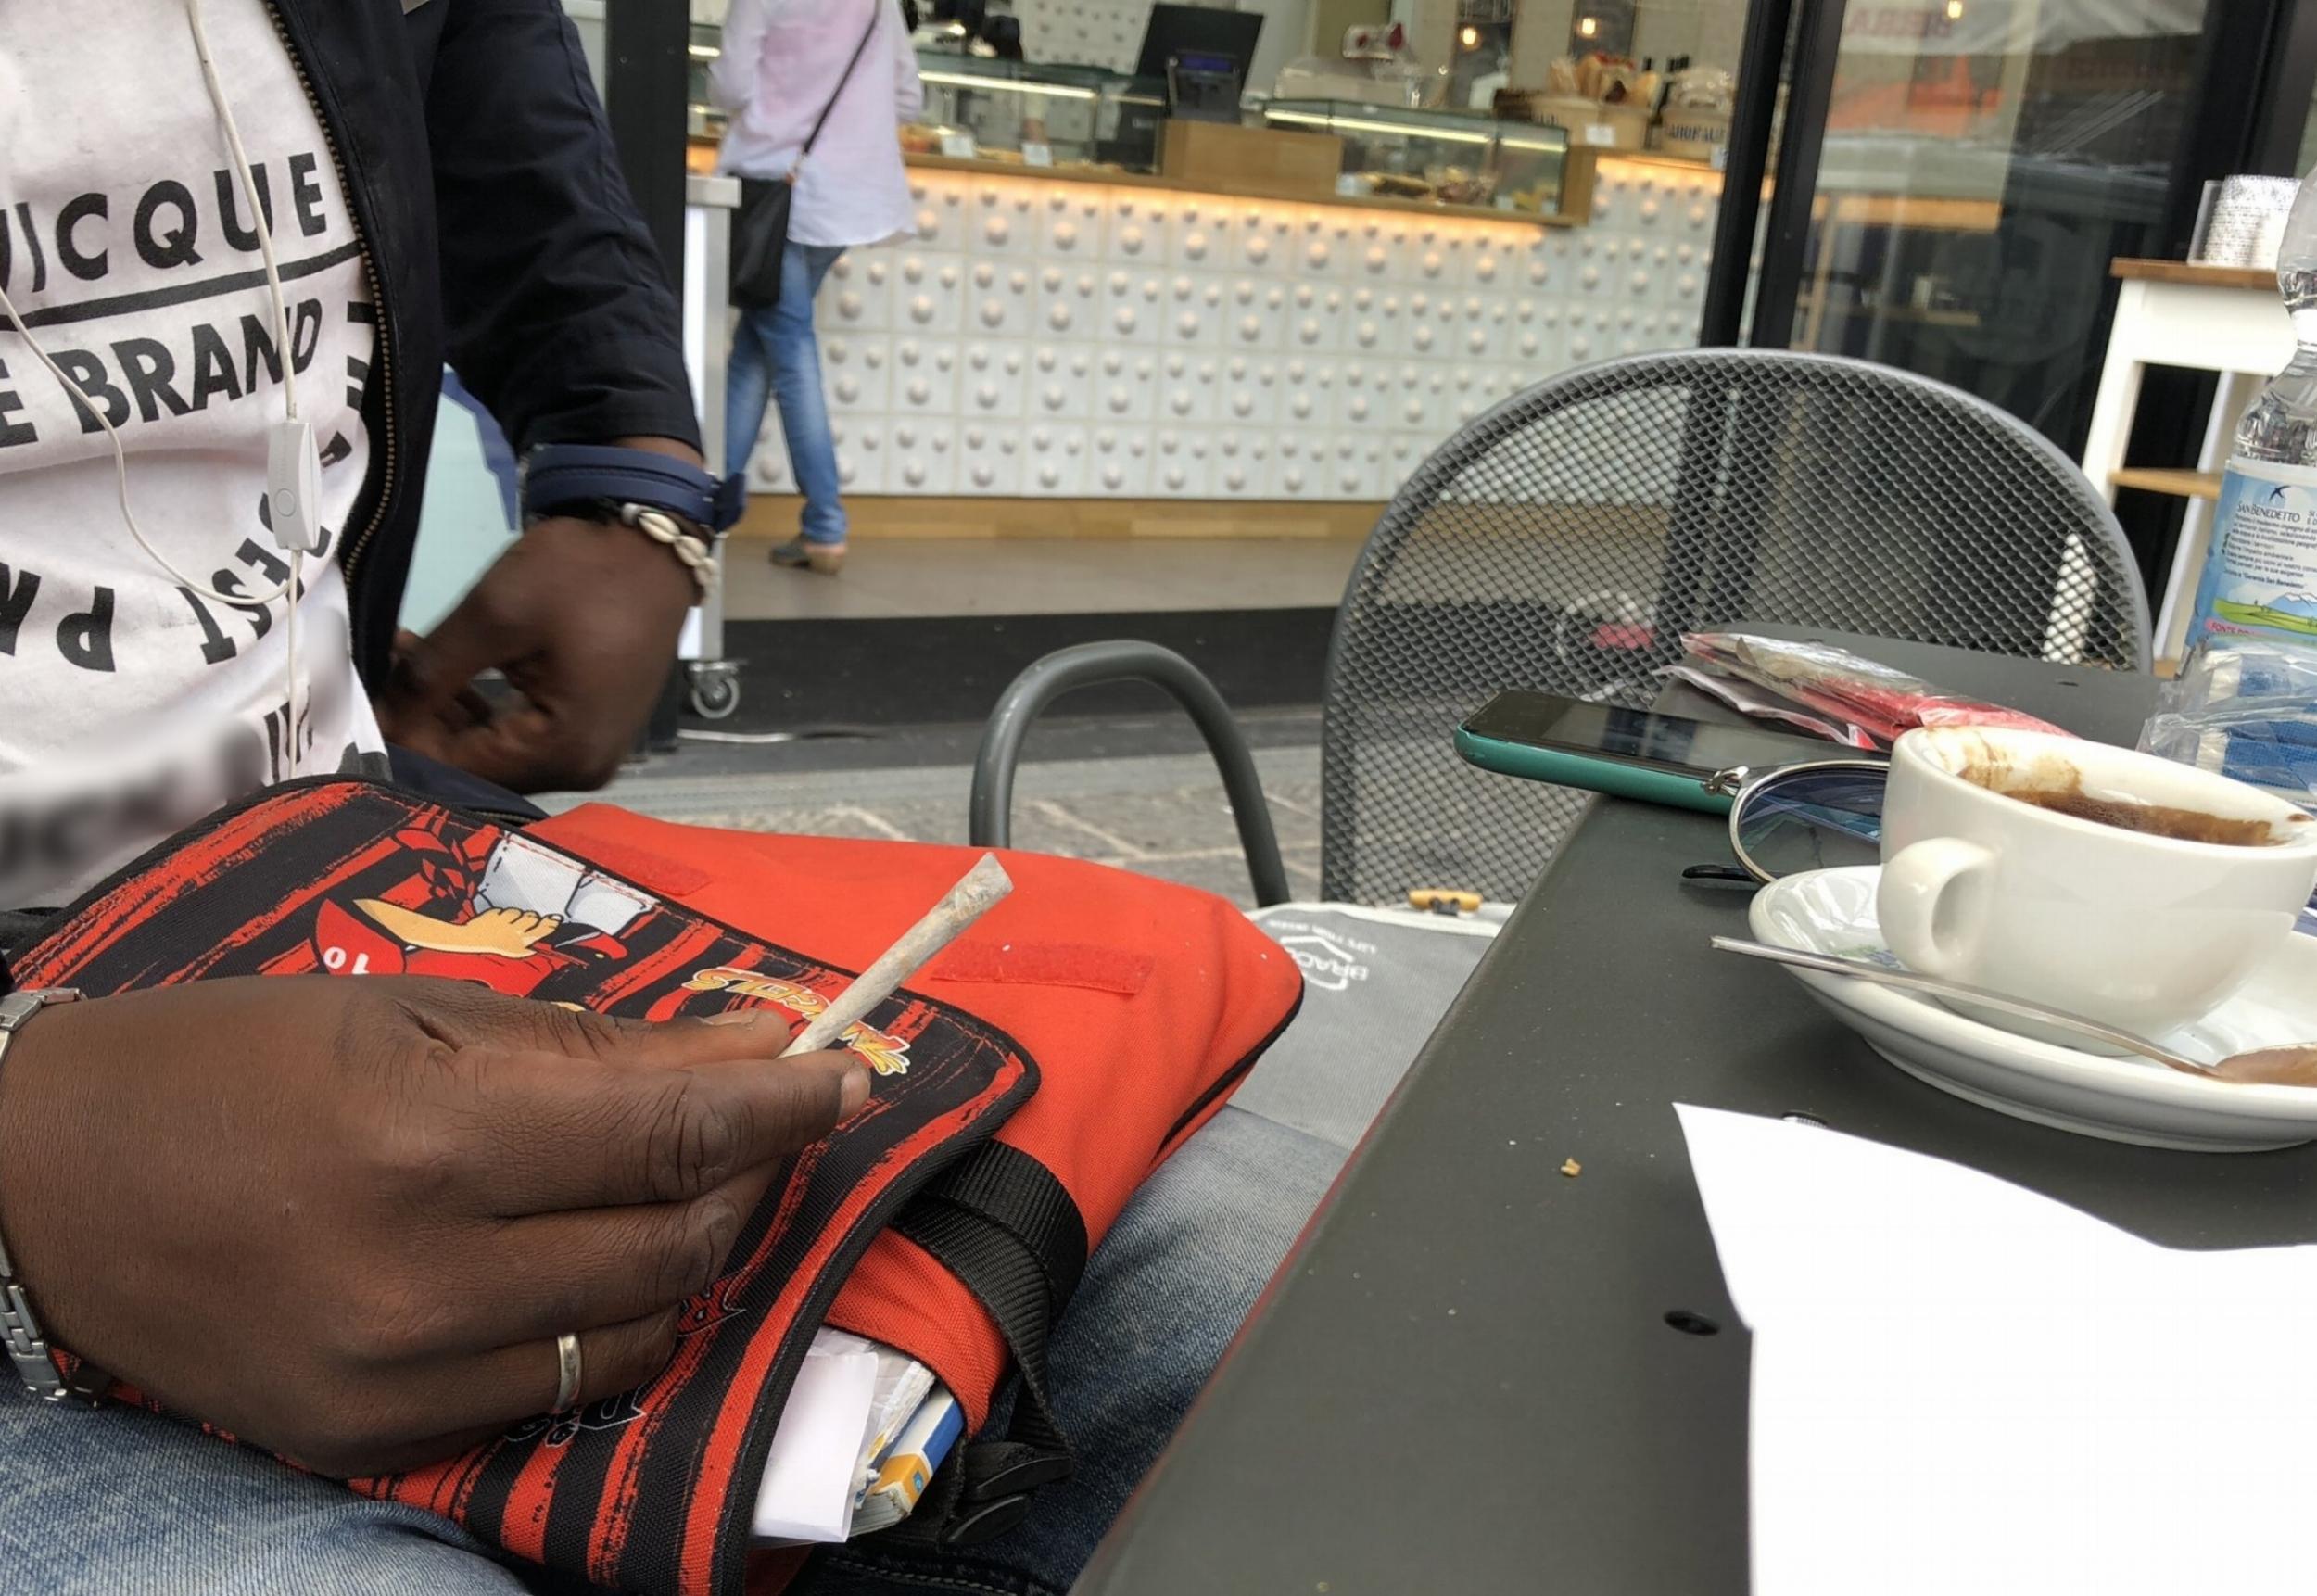 Yoro rolls his cigarette. Naples, Italy; May 2018. © Pamela Kerpius